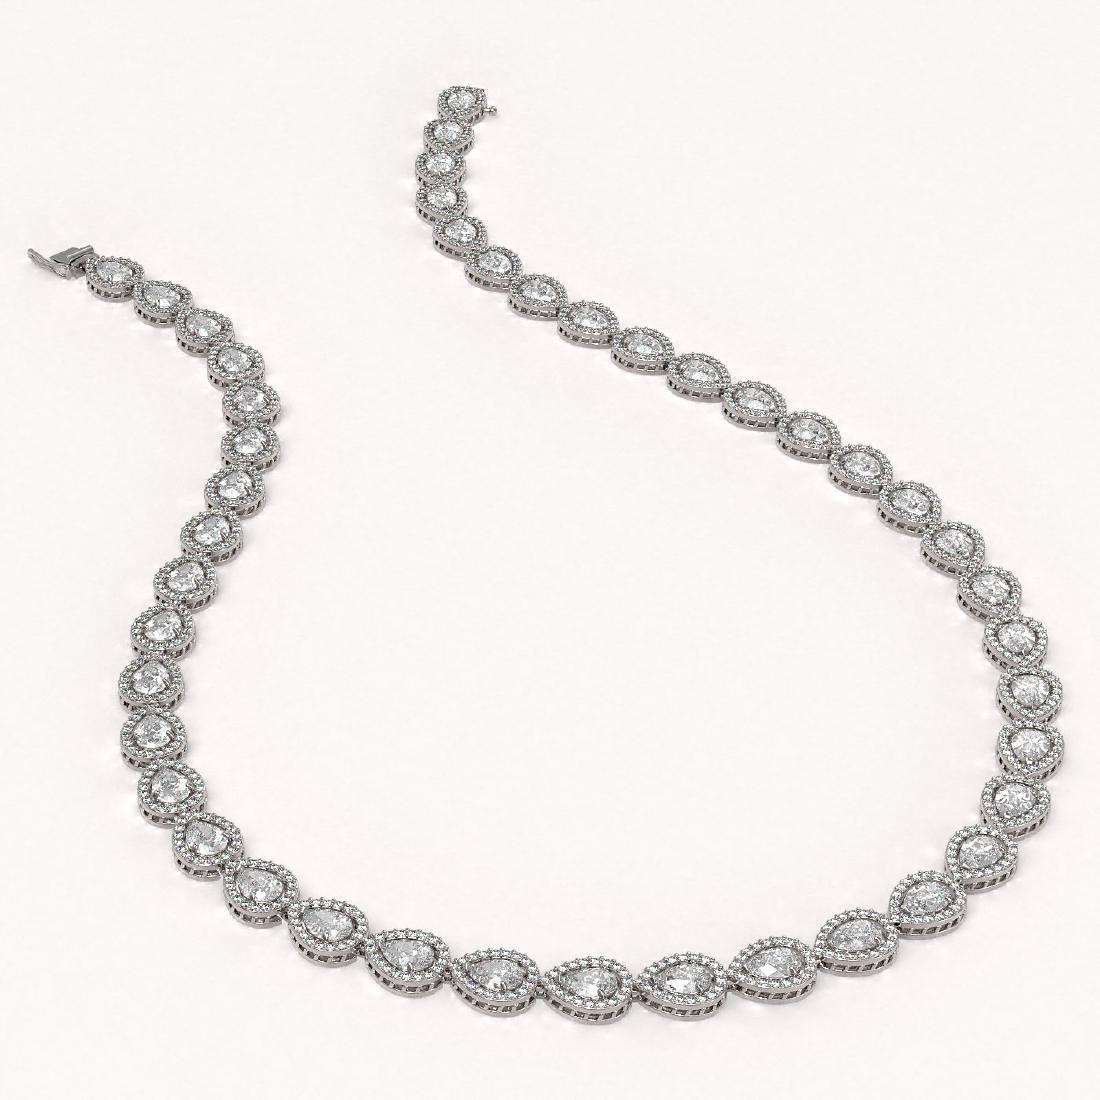 28.74 CTW Pear Diamond Designer Necklace 18K White Gold - 2